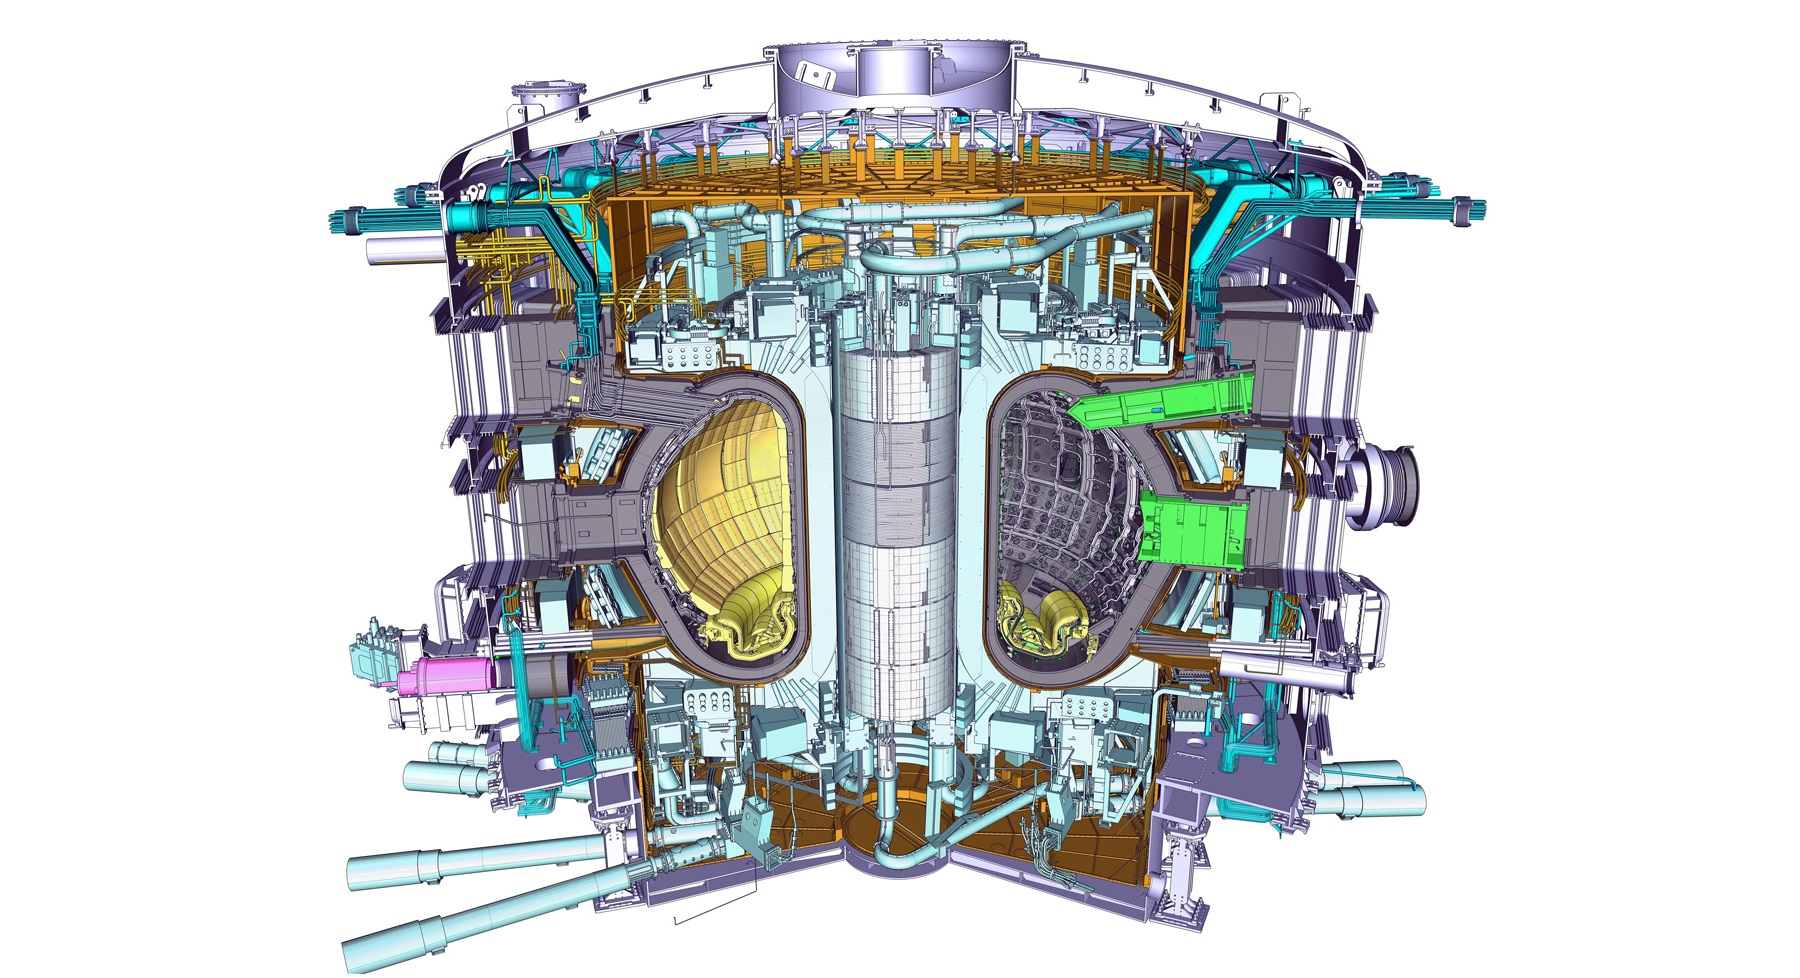 lockheed martin fusion reactor (2)